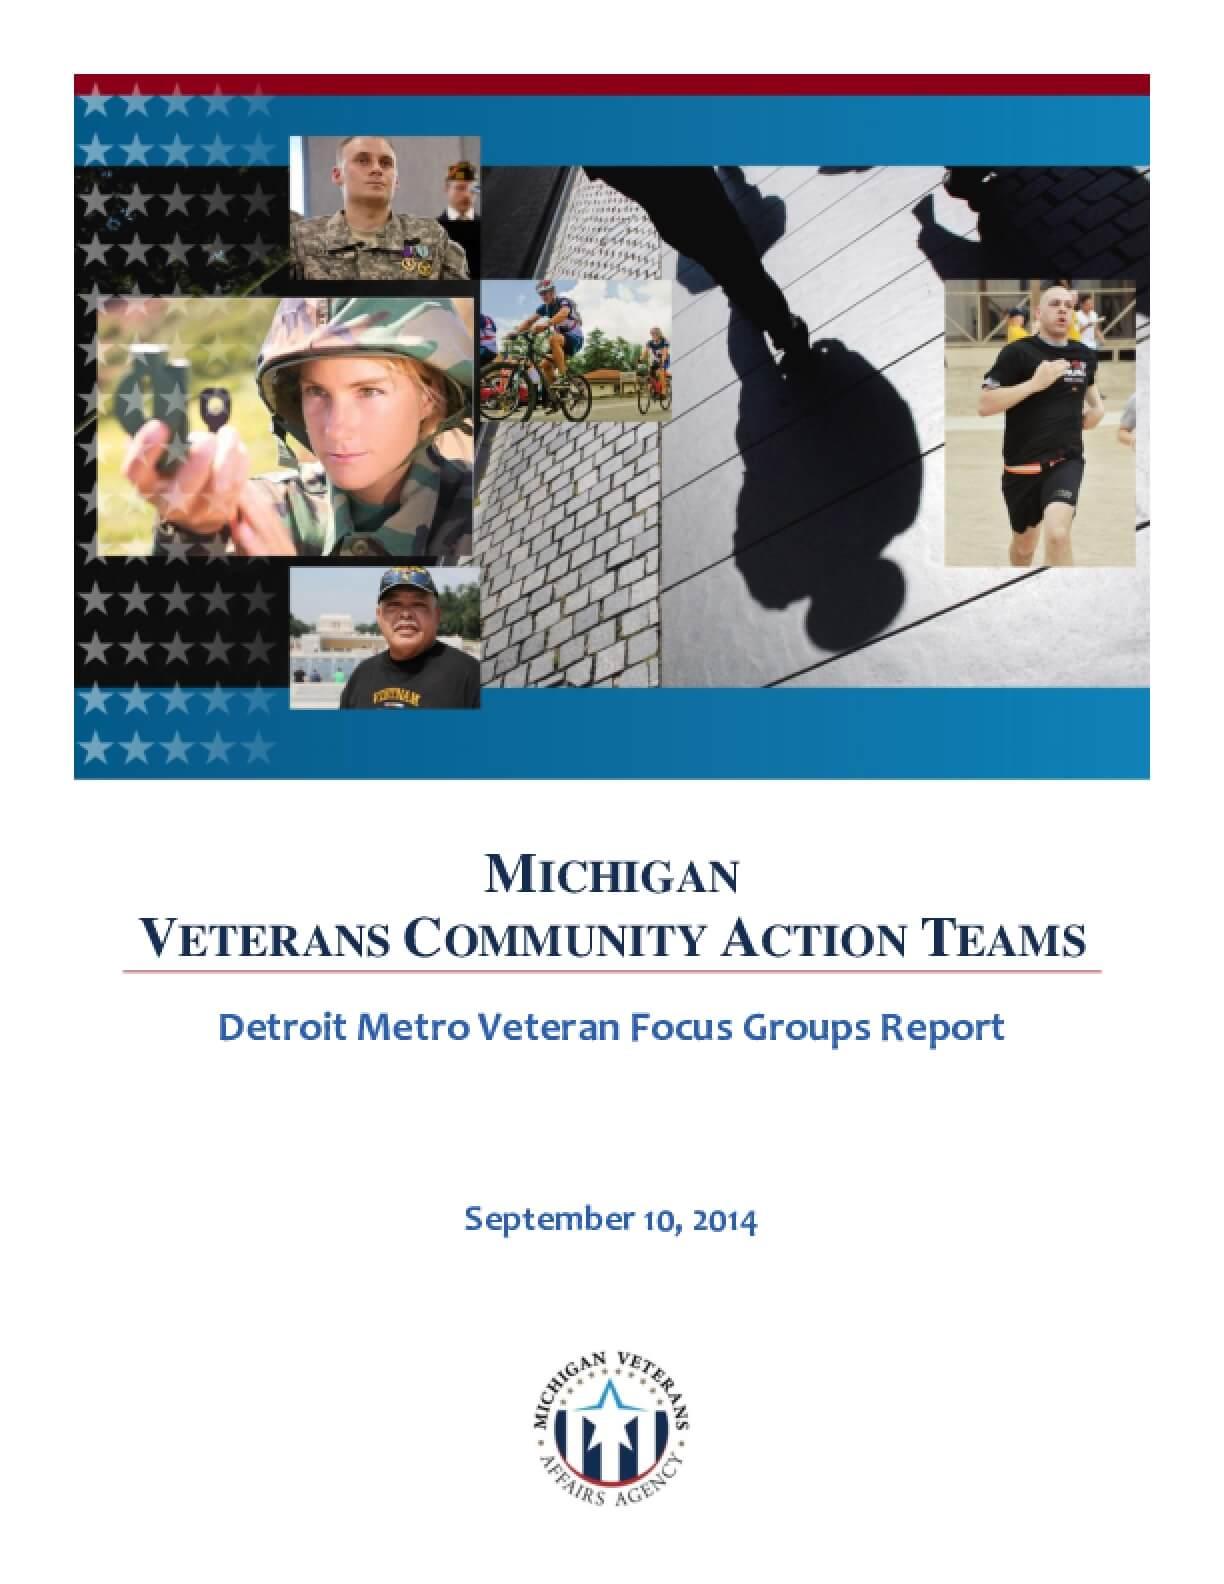 Michigan Veterans Community Action Teams: Detroit Metro Veteran Focus Groups Report